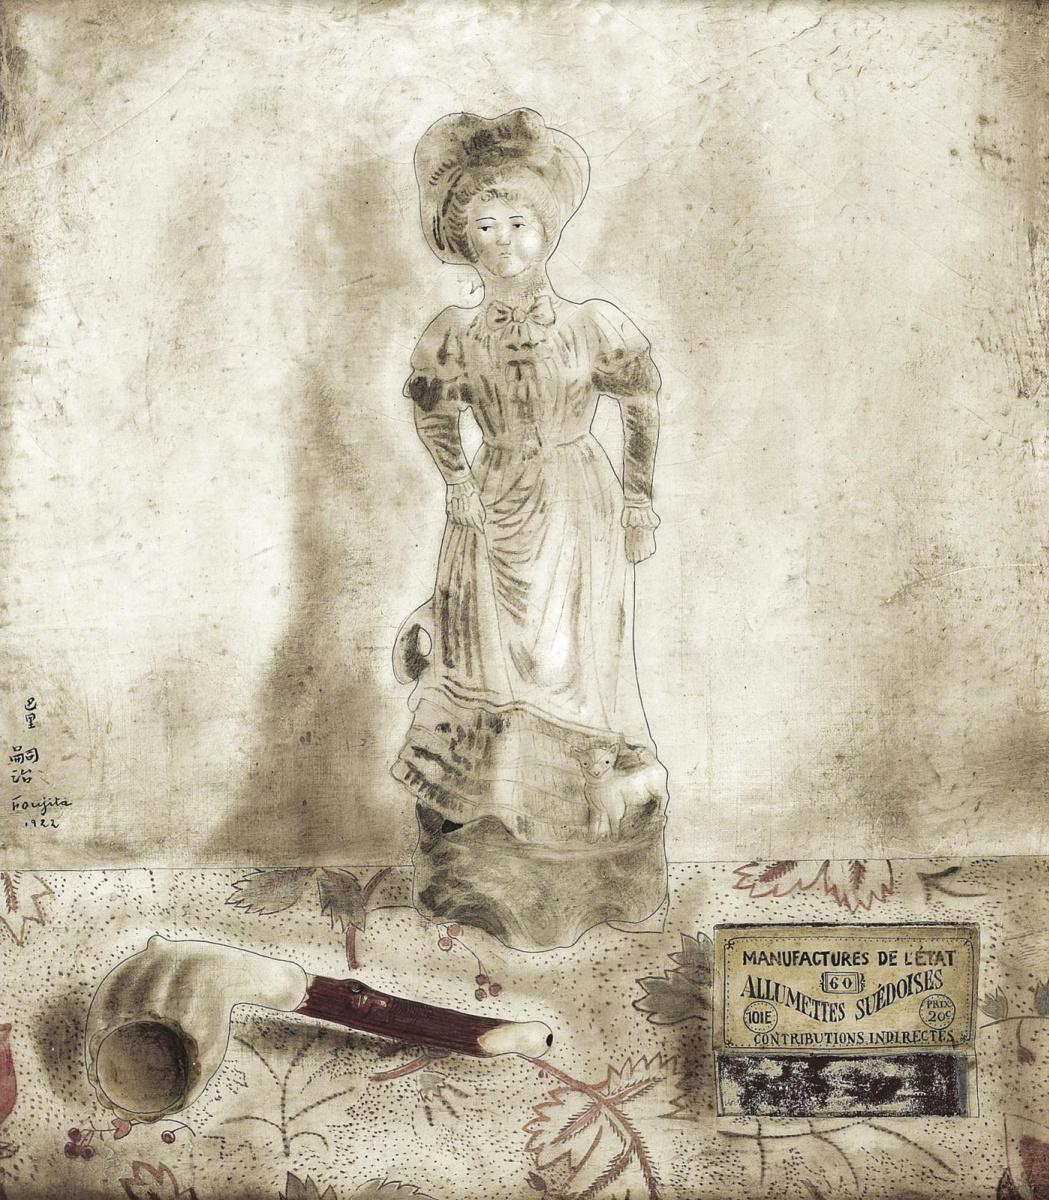 Цугухару Фудзита (Леонар Фужита). Натюрморт с фарфоровой статуэткой